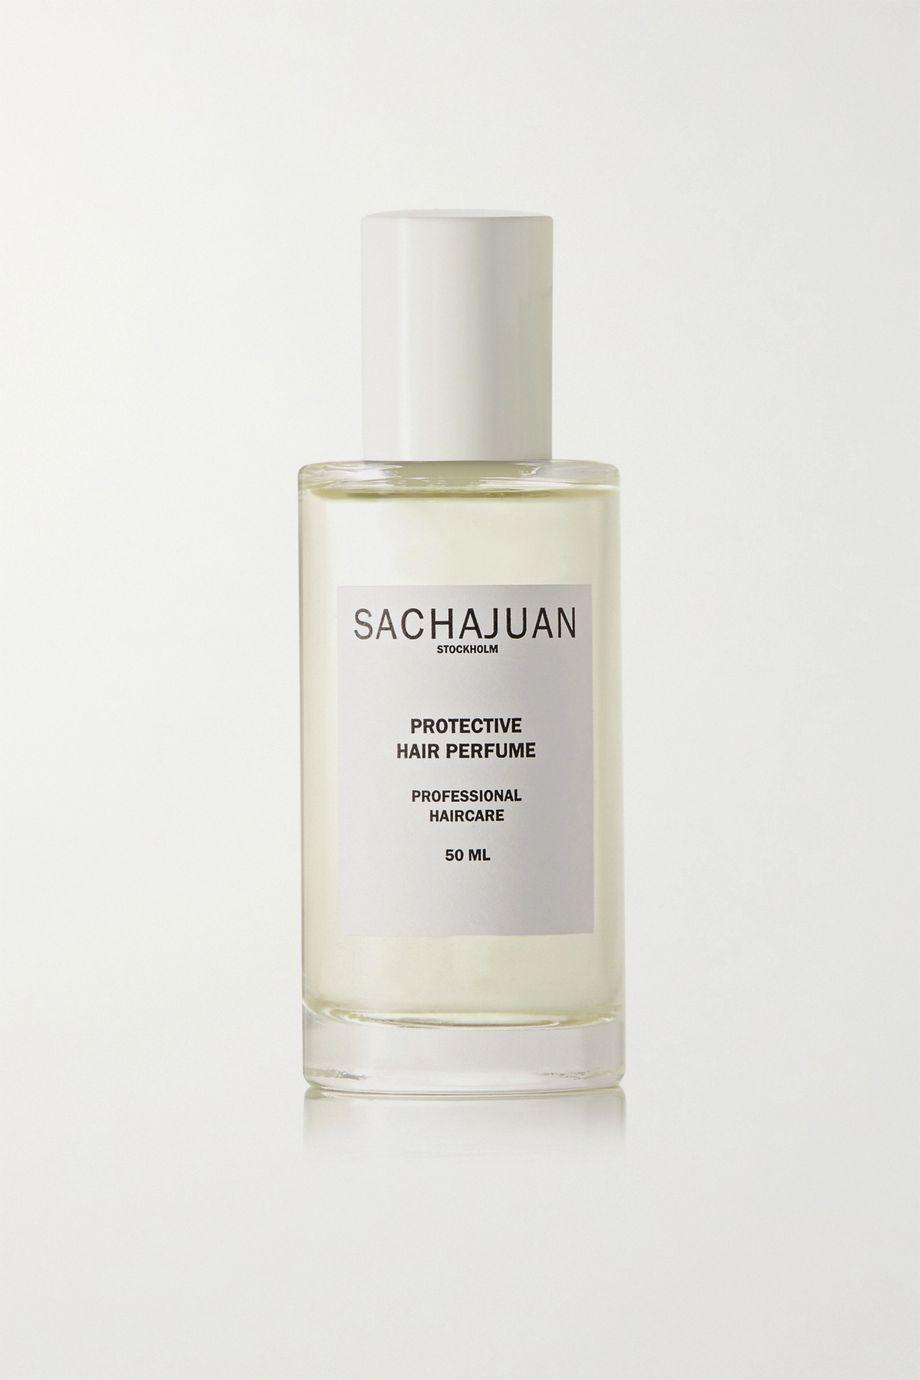 SACHAJUAN Protective Hair Perfume, 50ml